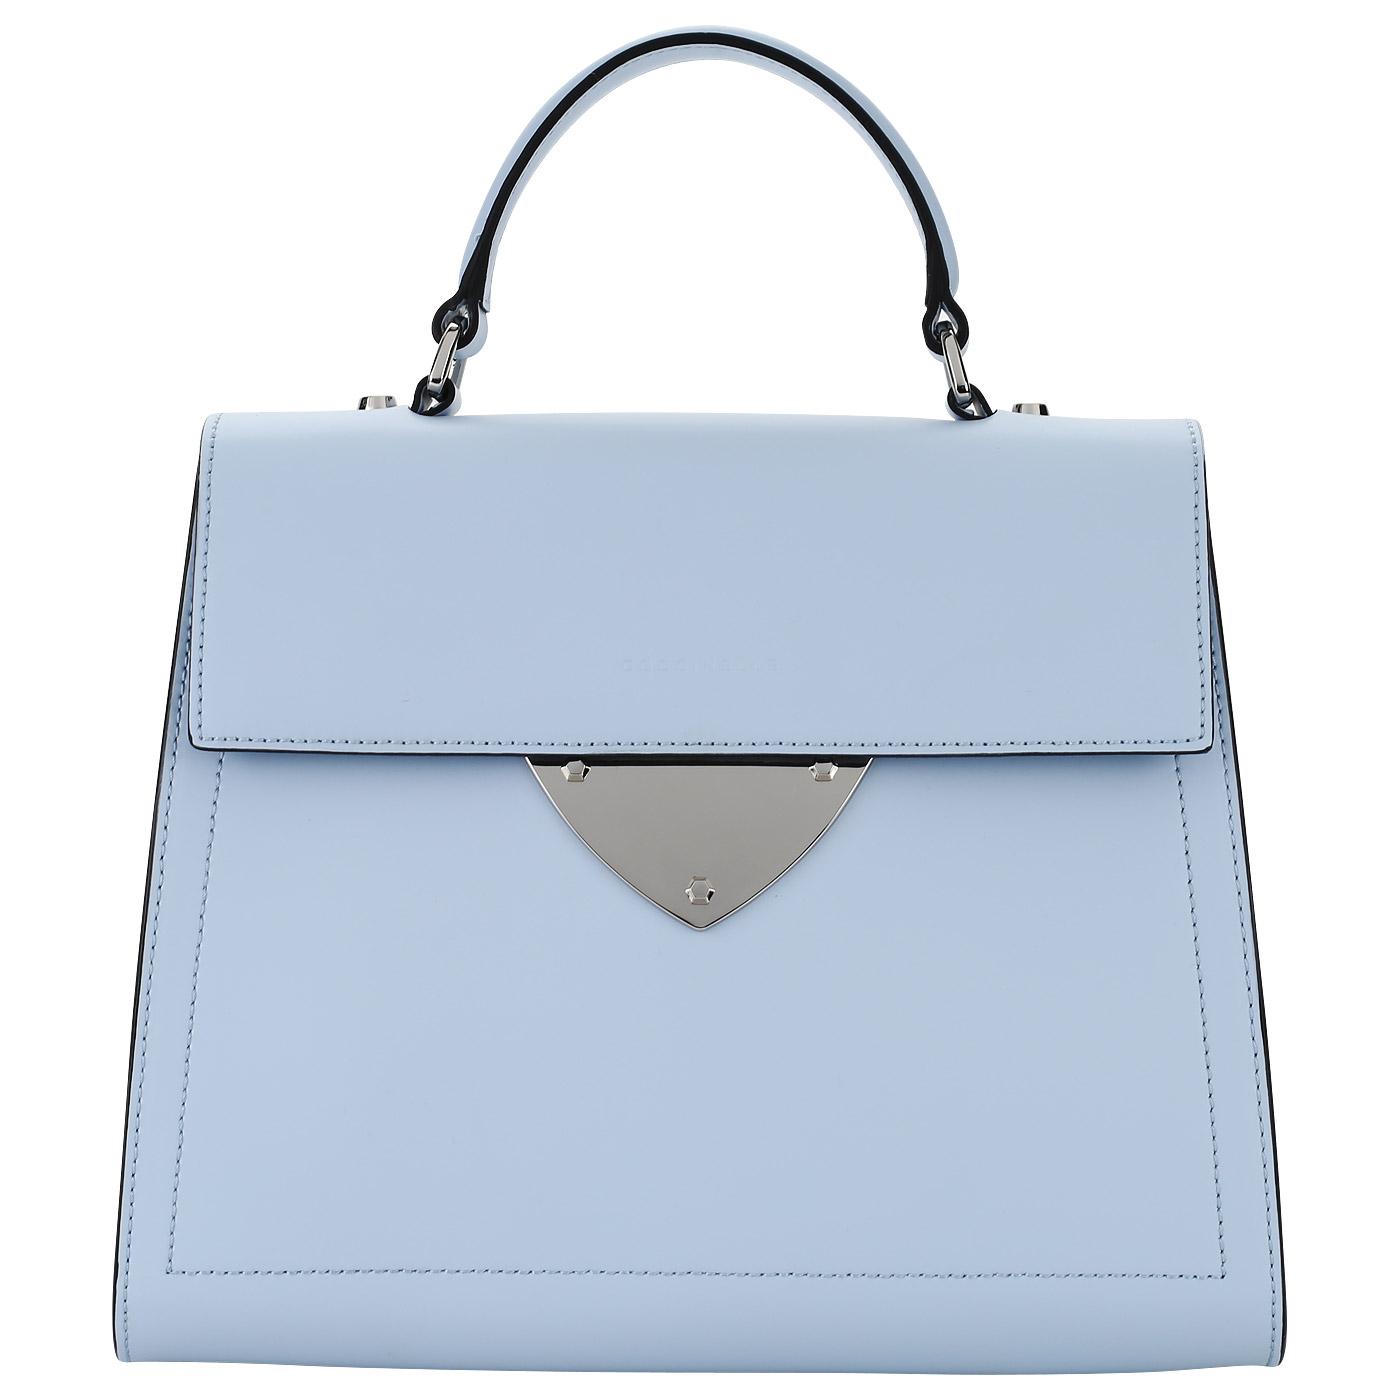 df198faa306b Женская сумка из голубой кожи Coccinelle B14 Design B06 18 03 ...